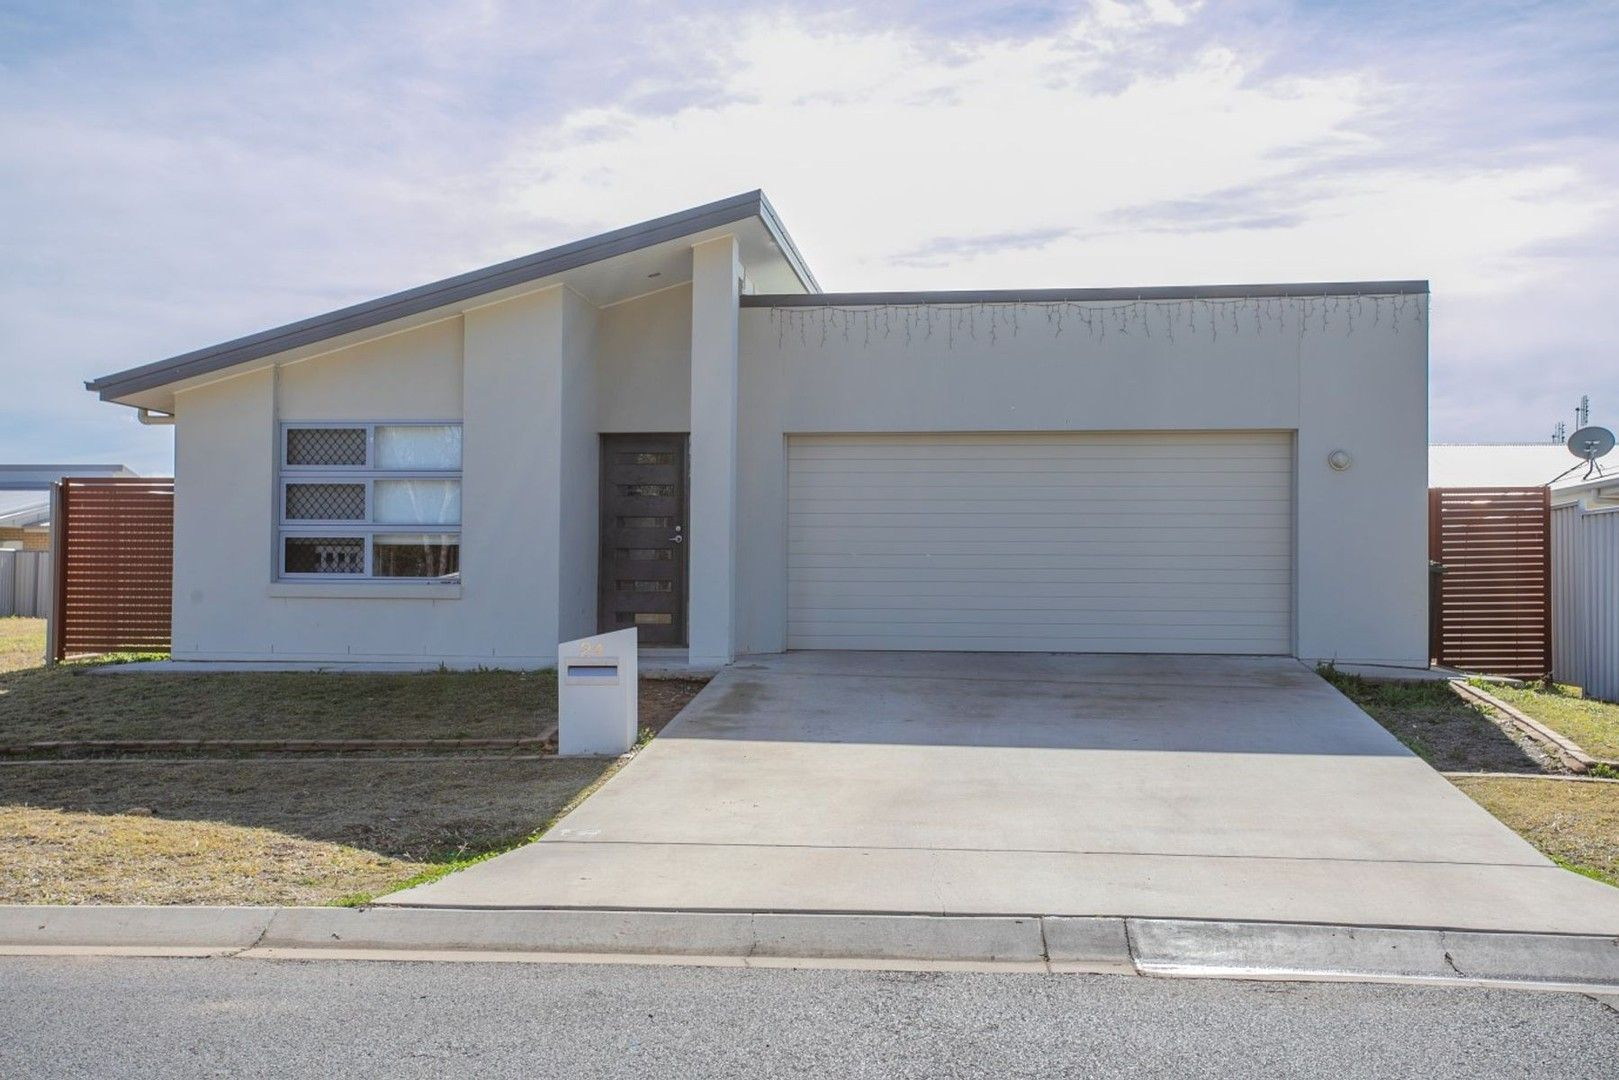 24 Ellem Drive, Chinchilla QLD 4413, Image 0